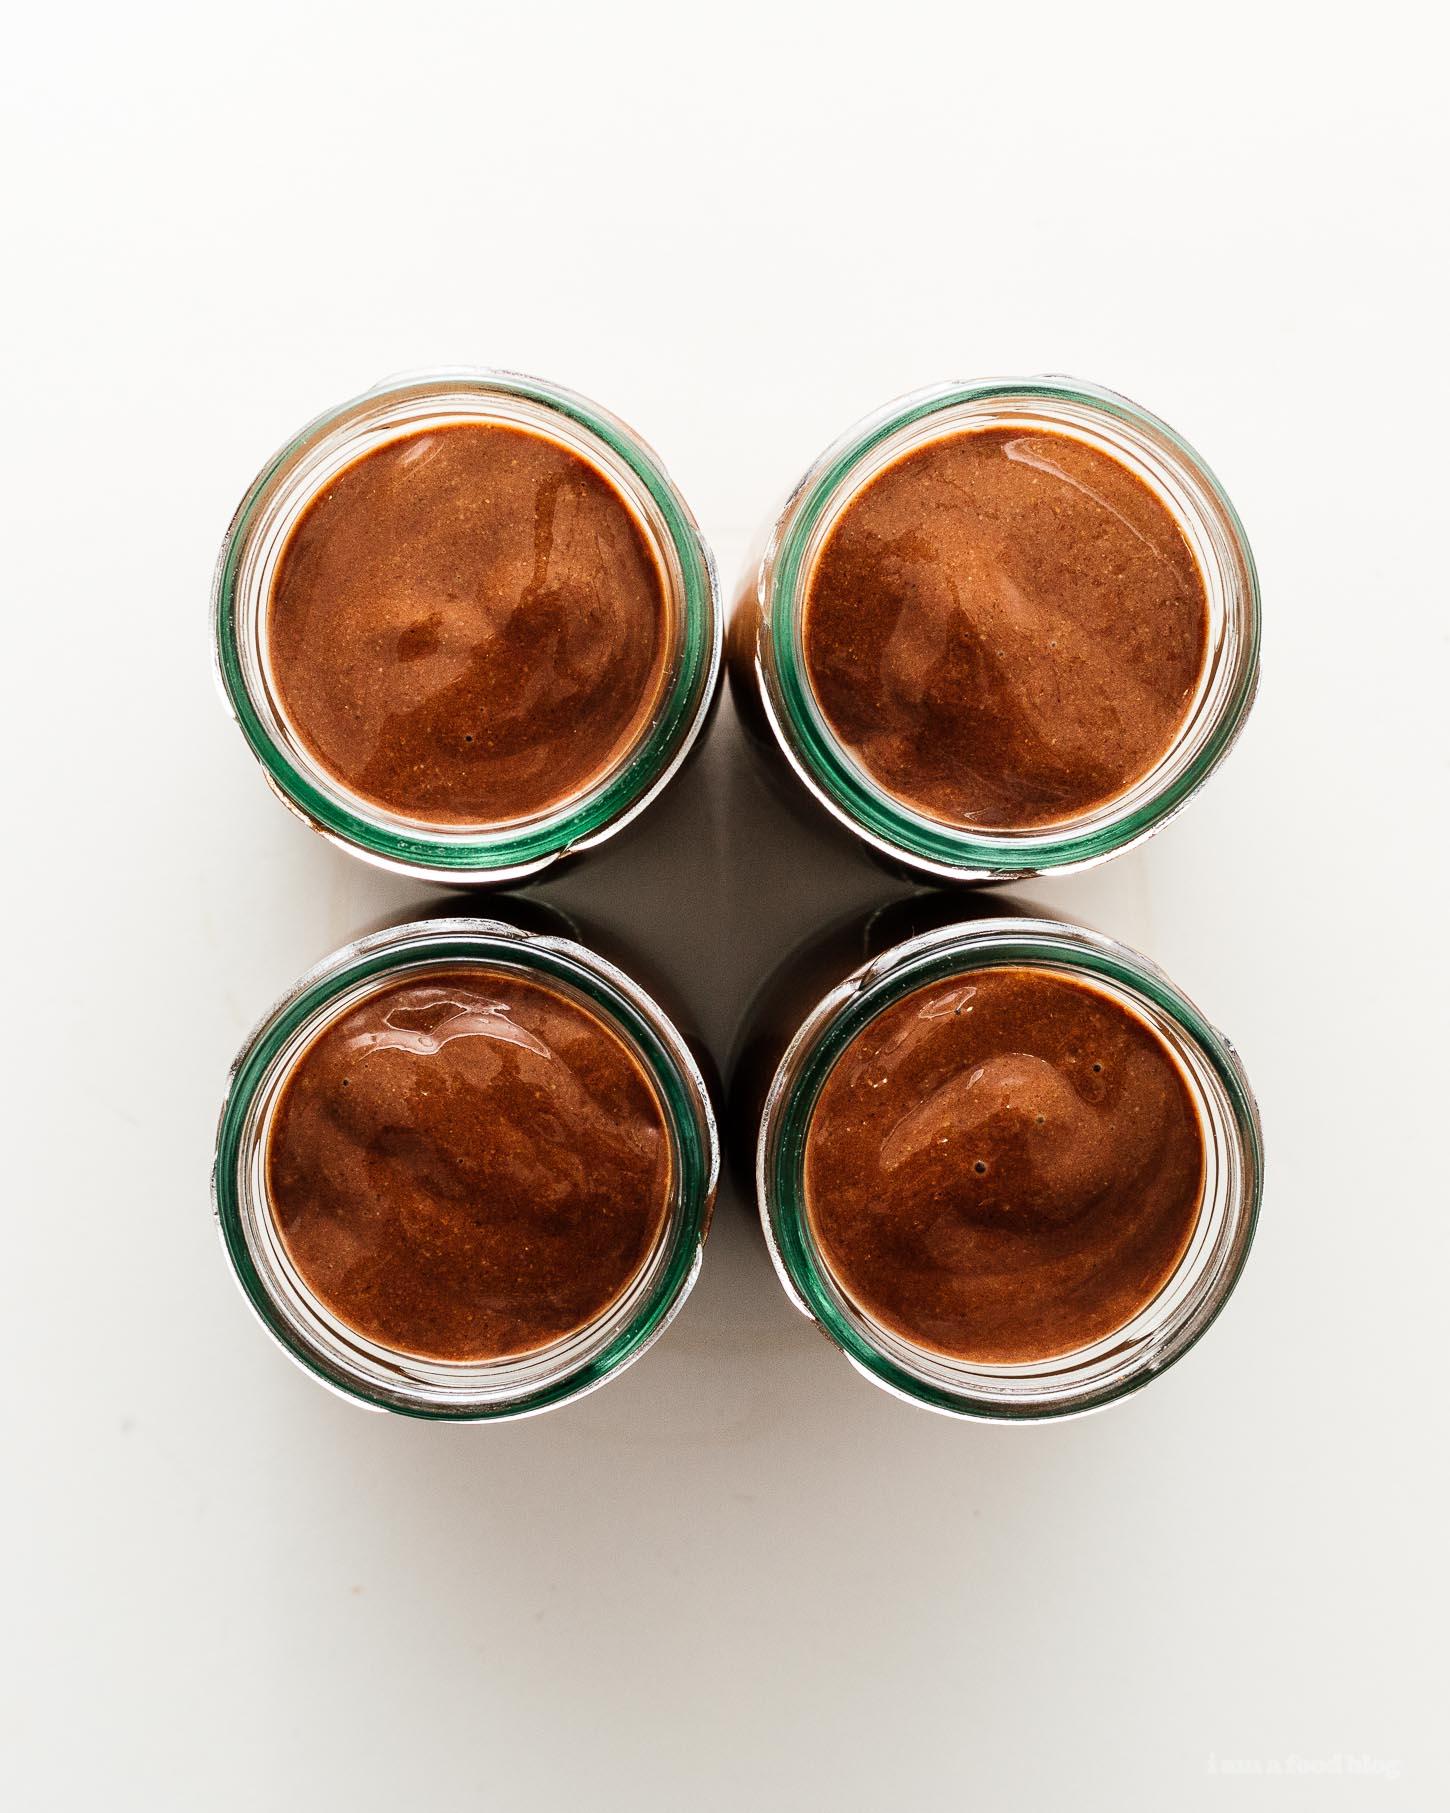 4 Ingredient Vegan Paleo Chocolate Chia Pudding   www.iamafoodblog.com